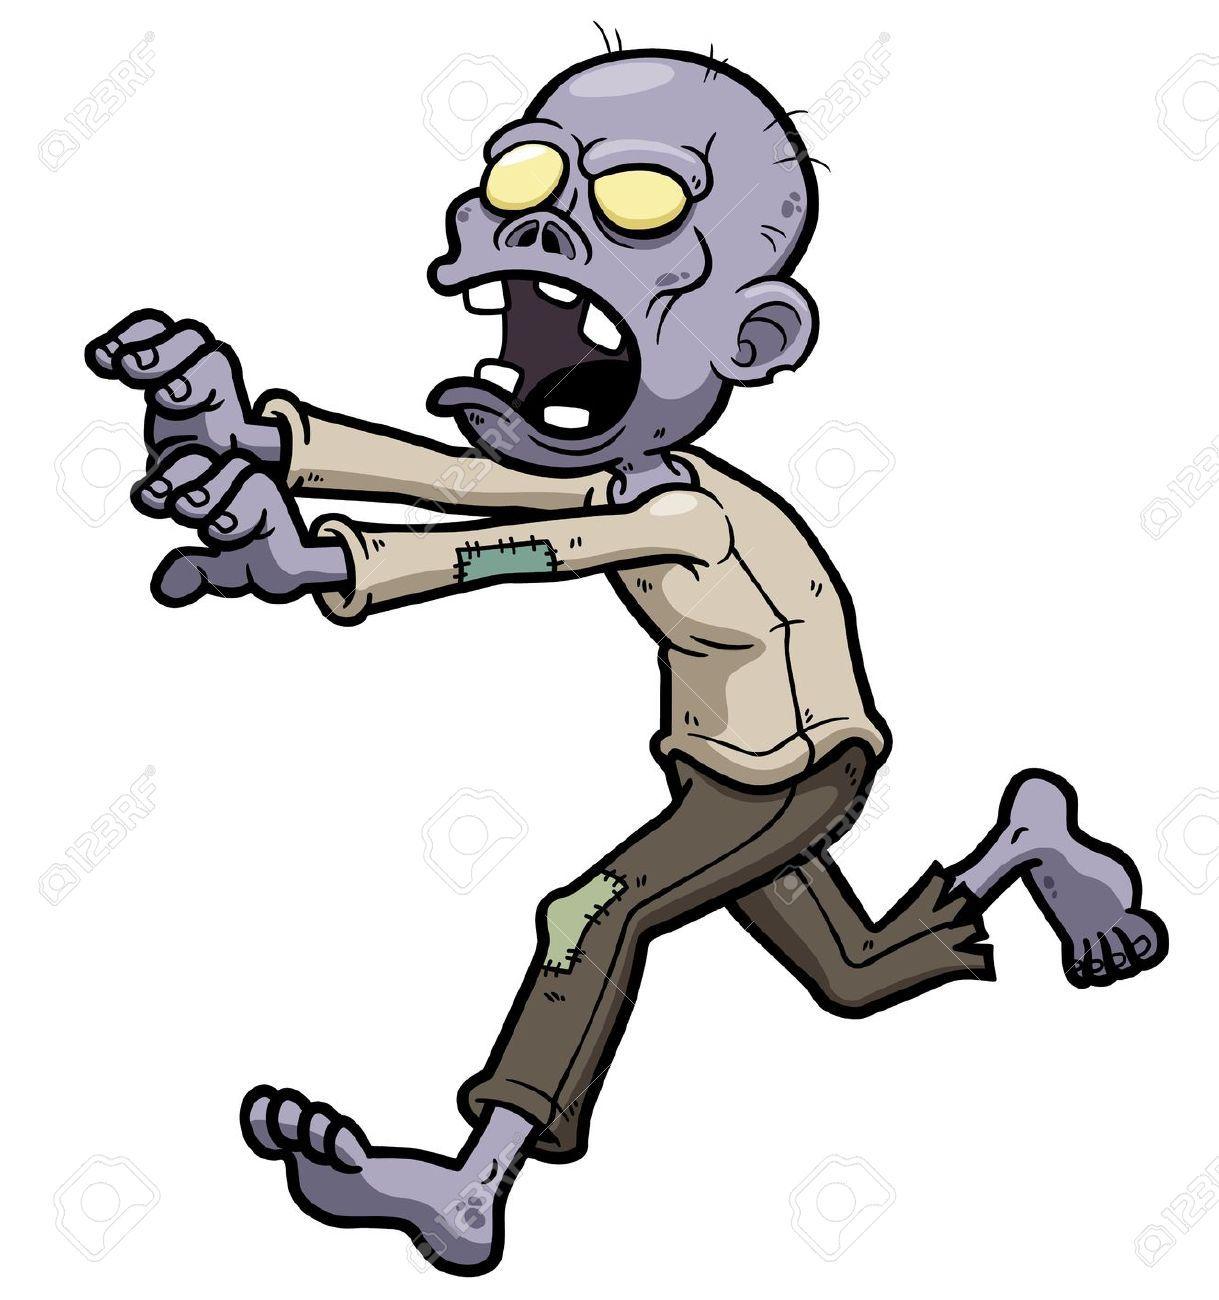 Zombie Cartoon Cliparts, Stock Vector And Royalty Free Zombie.